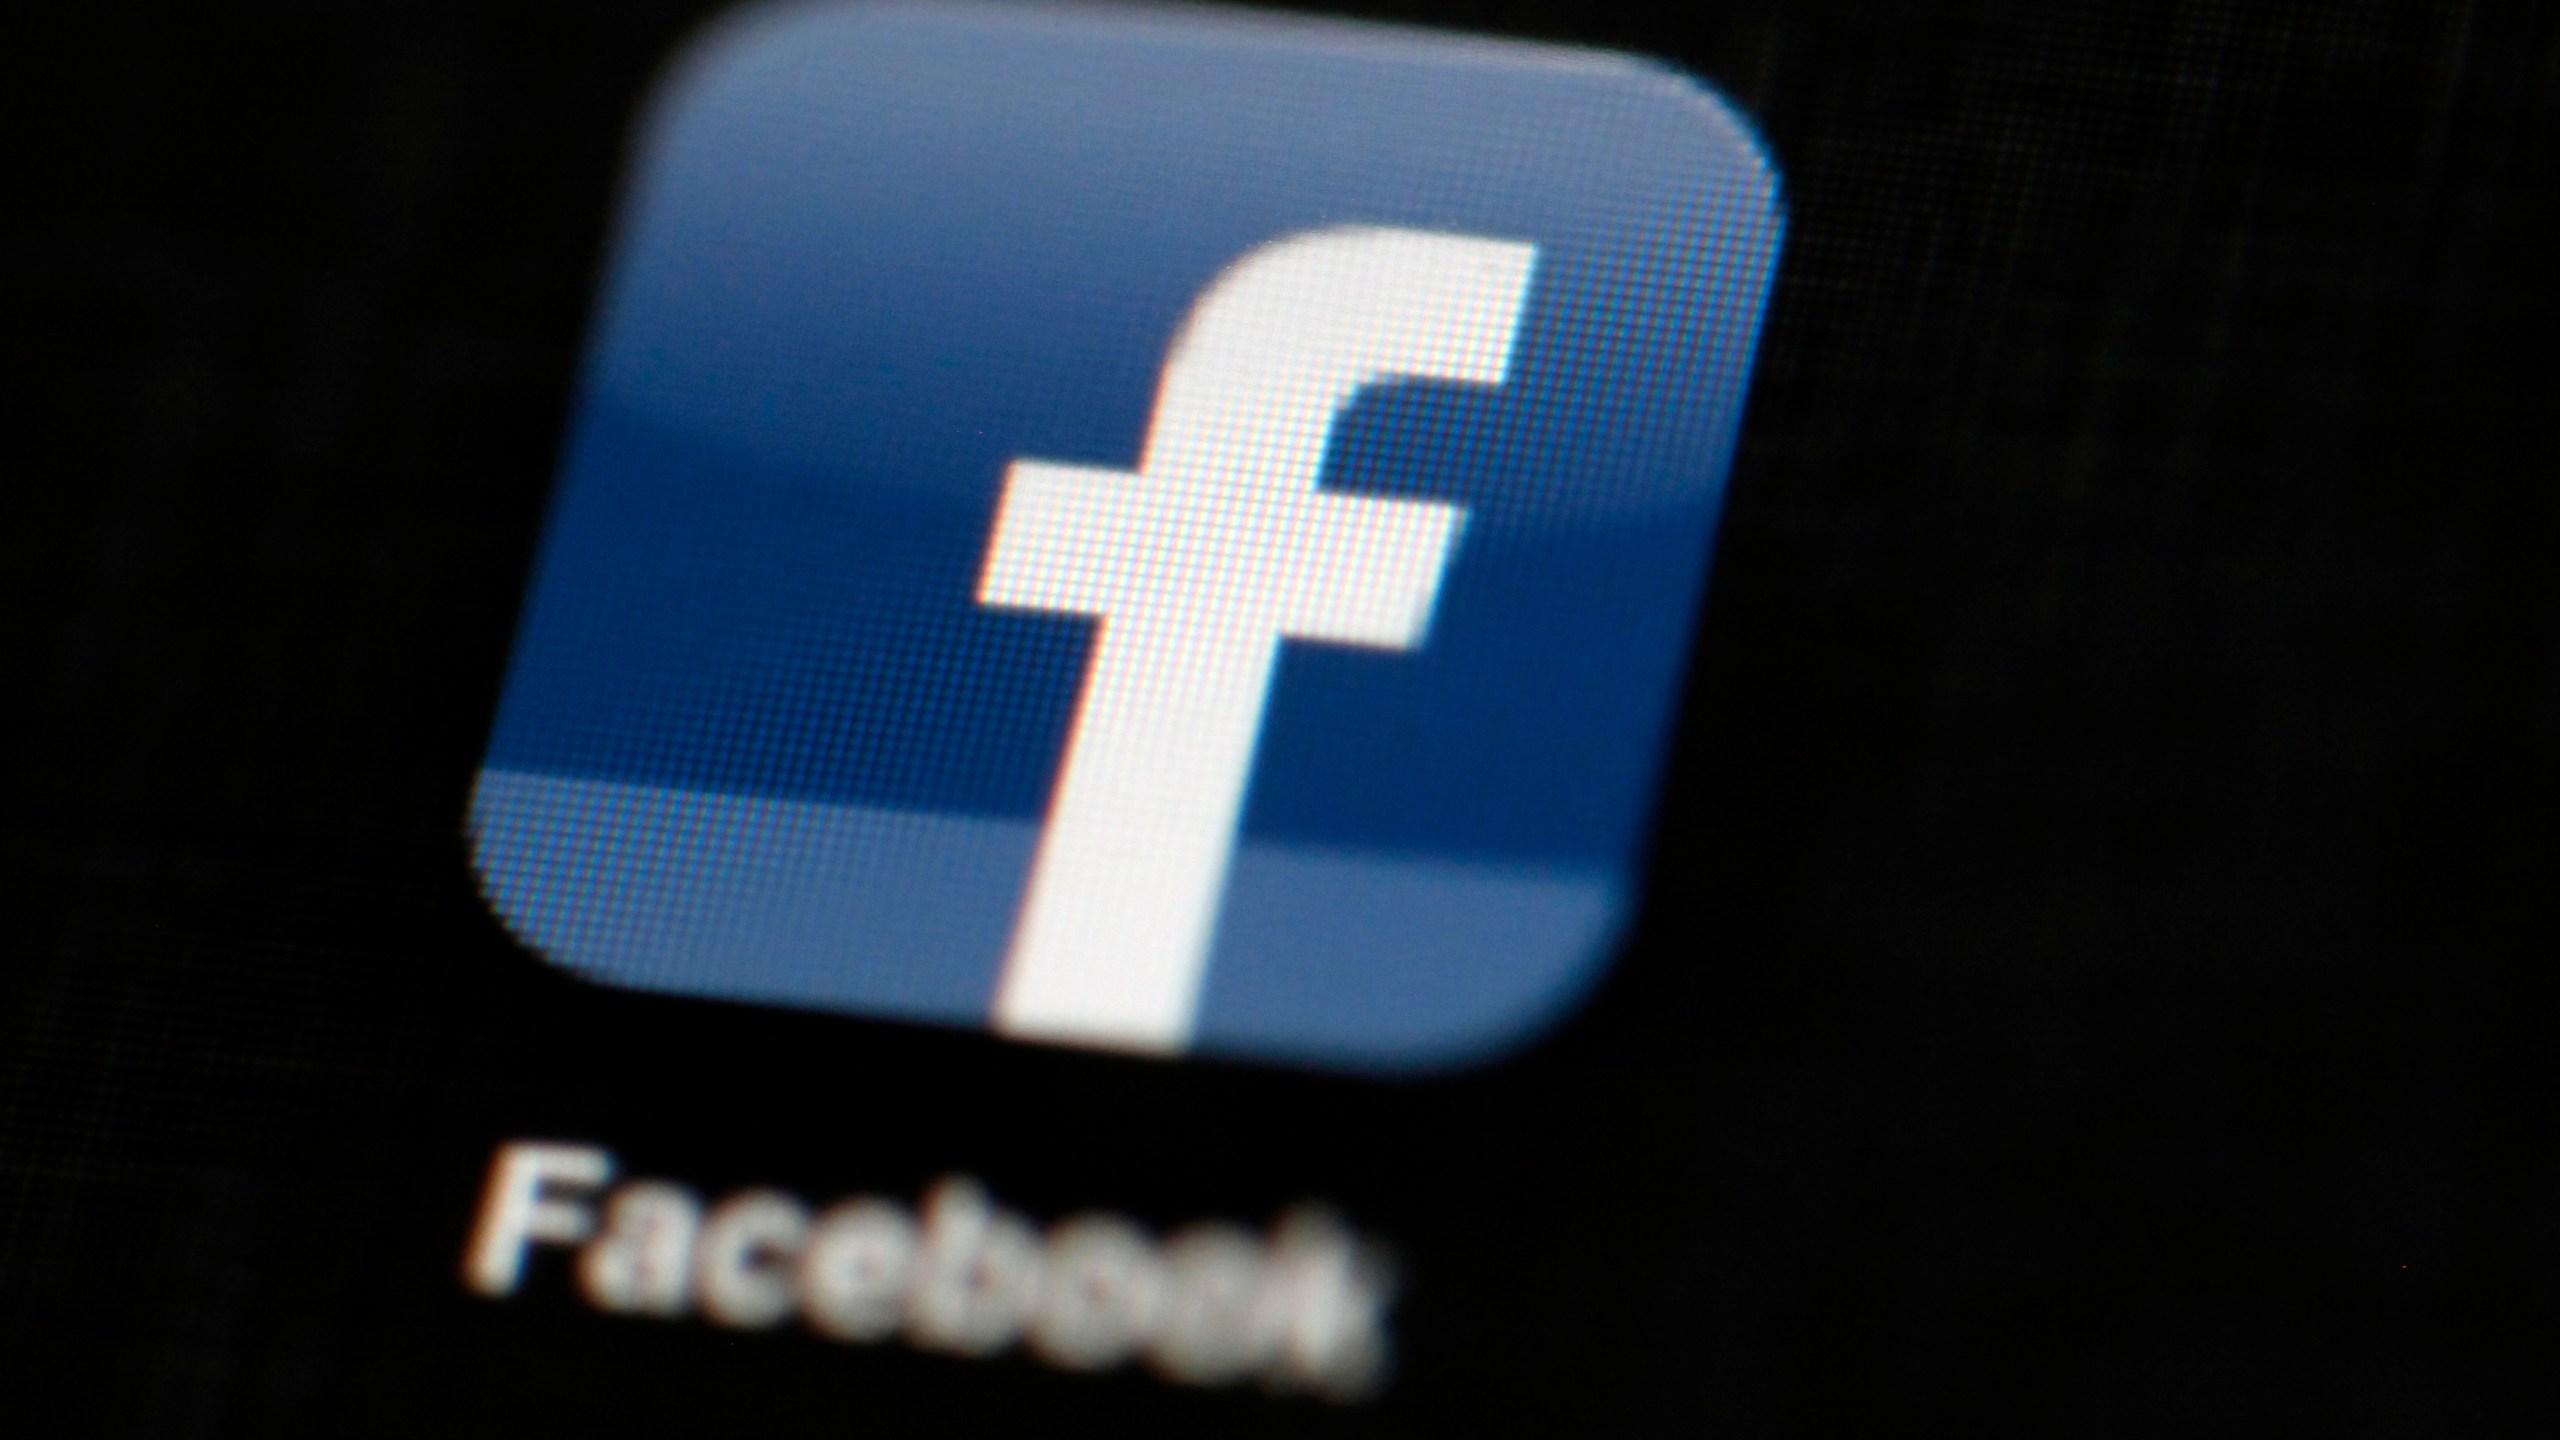 Facebook_Elections_Disruption_60352-159532.jpg93731287